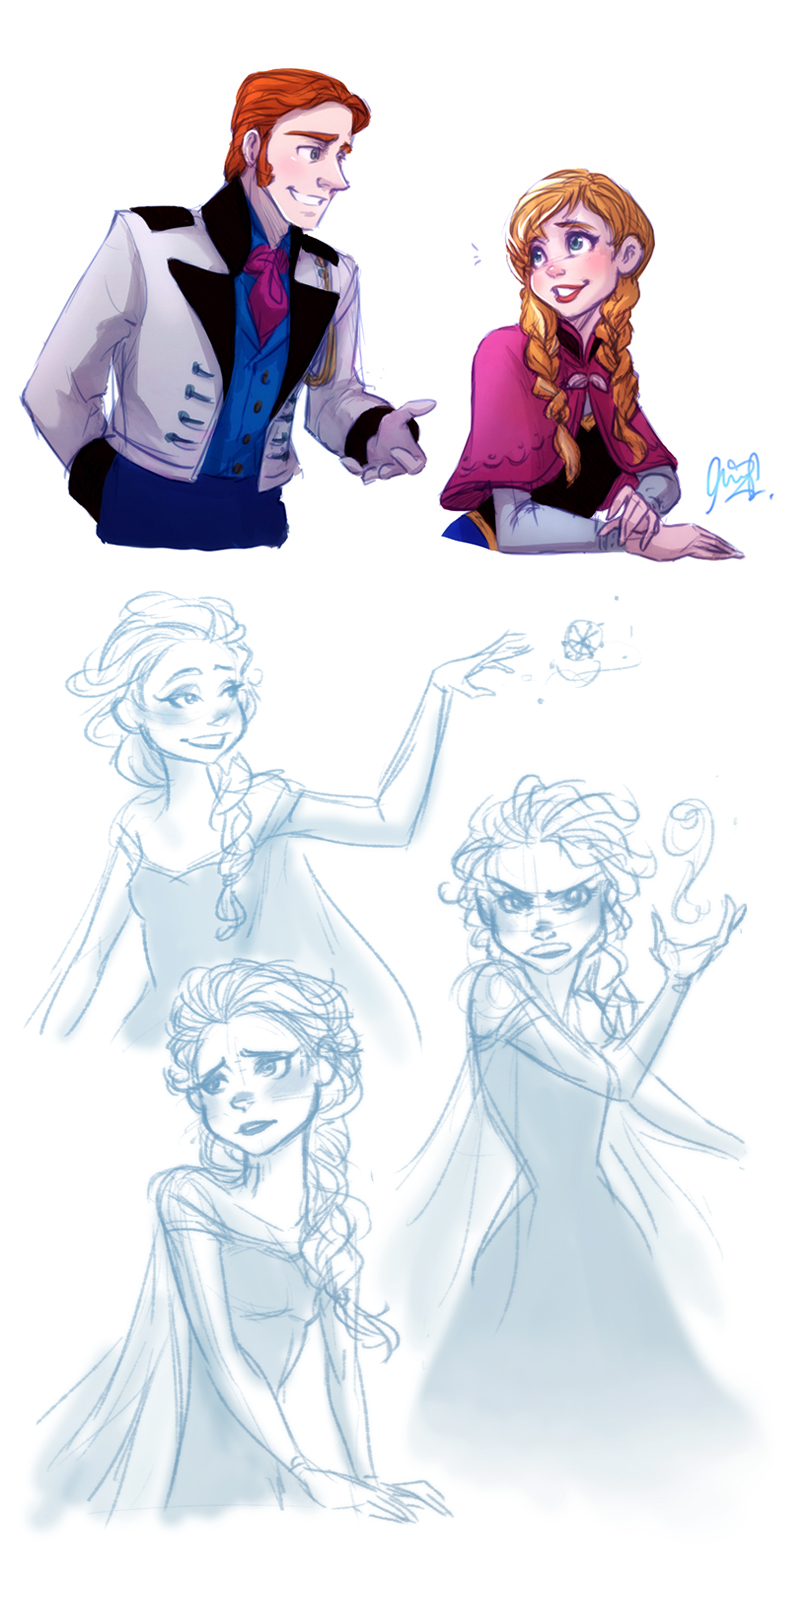 Disney's Frozen - Doodles by cherlye